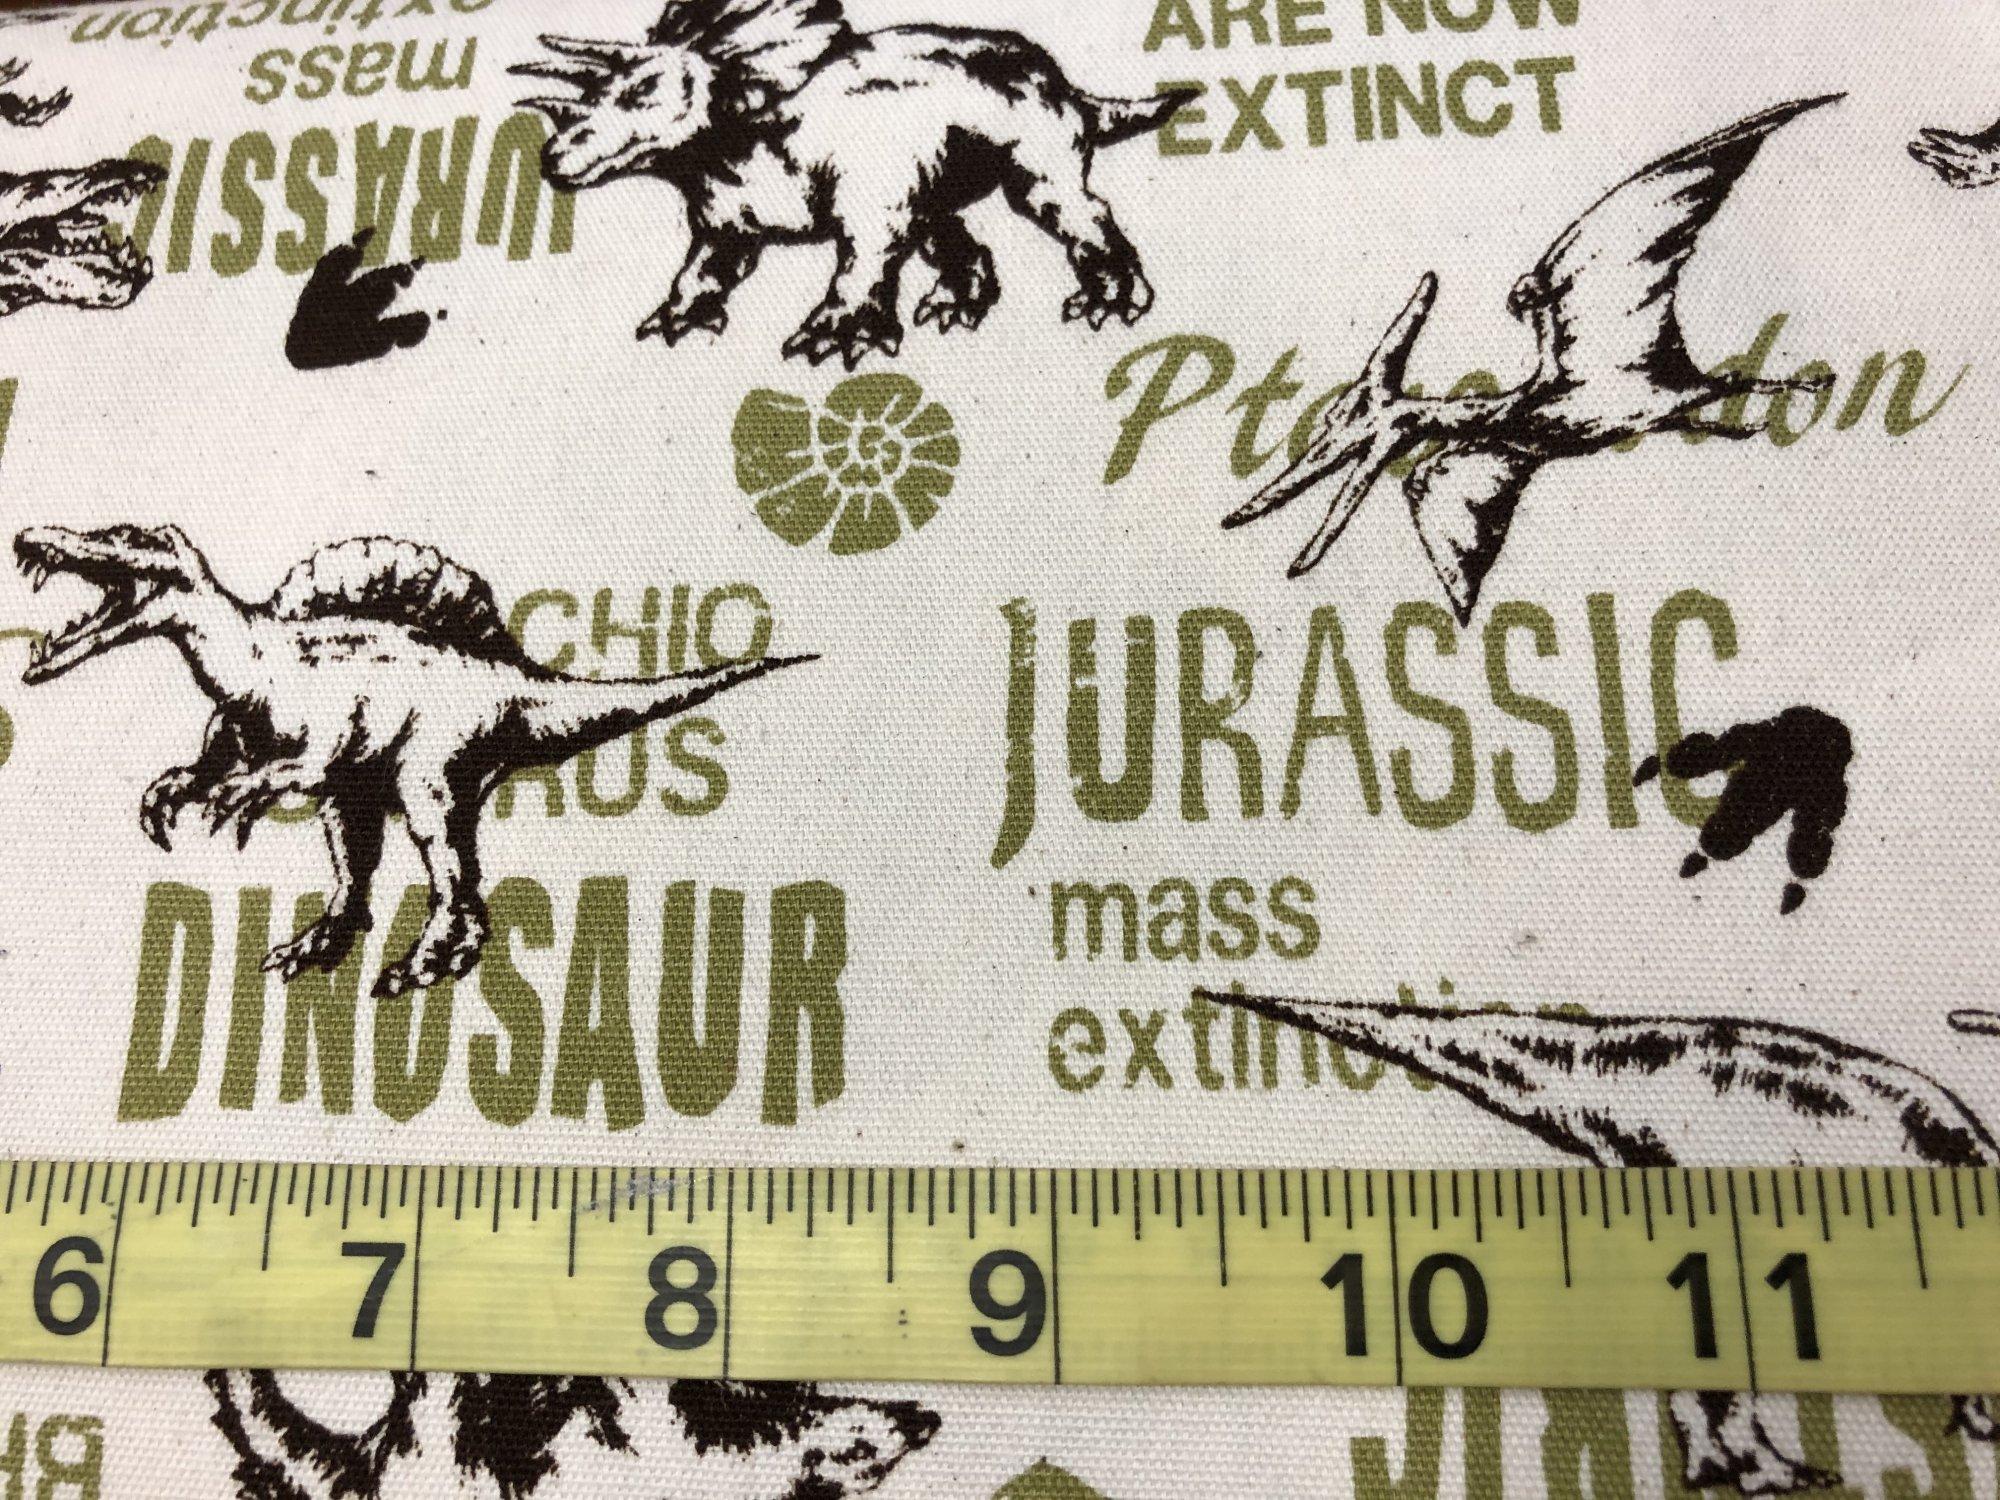 Dinosaurs Identified